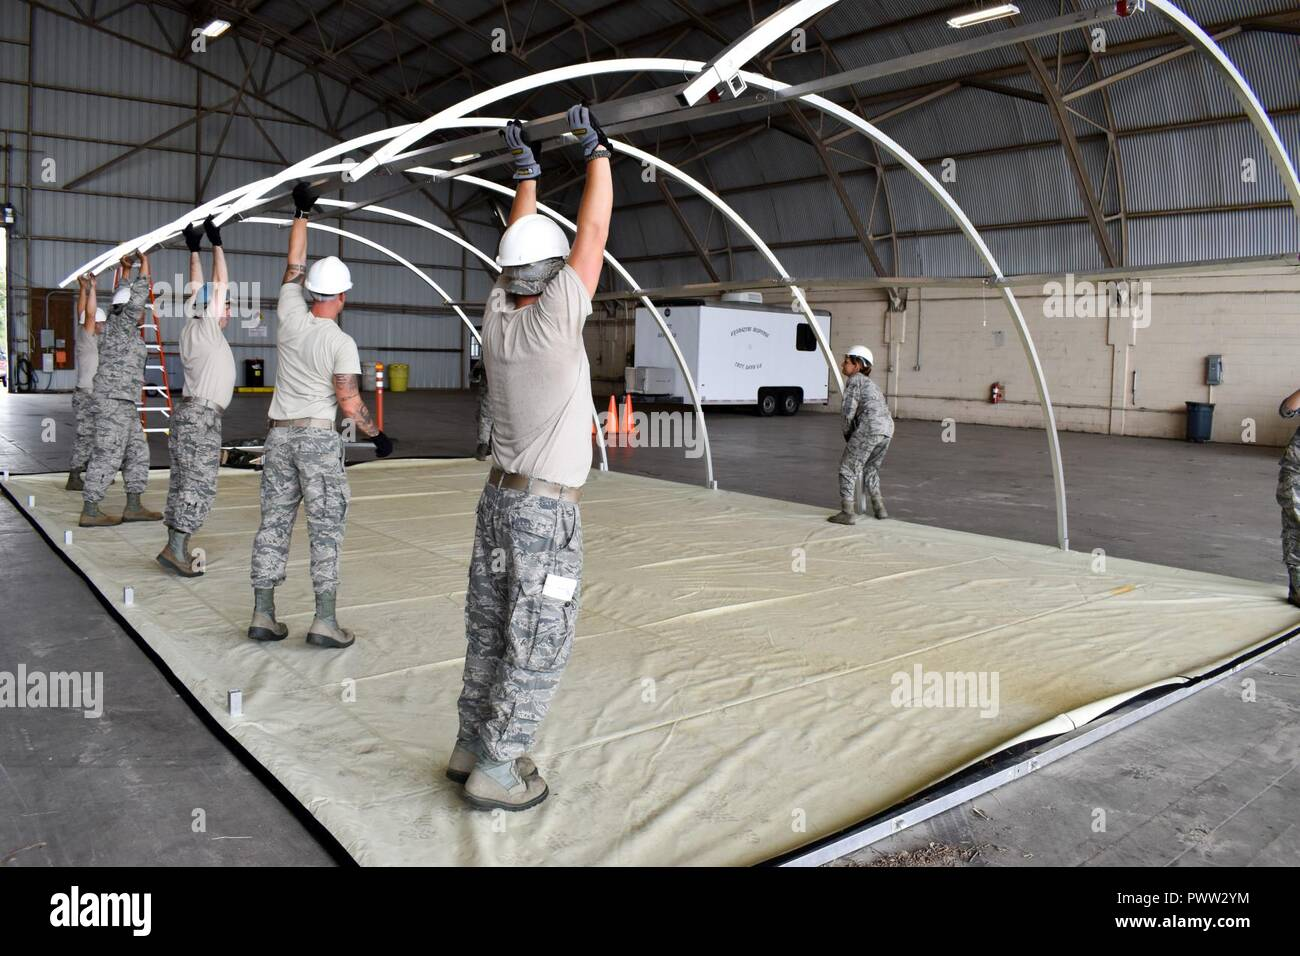 134th Services Flight Airmen, construct a temper tent during an